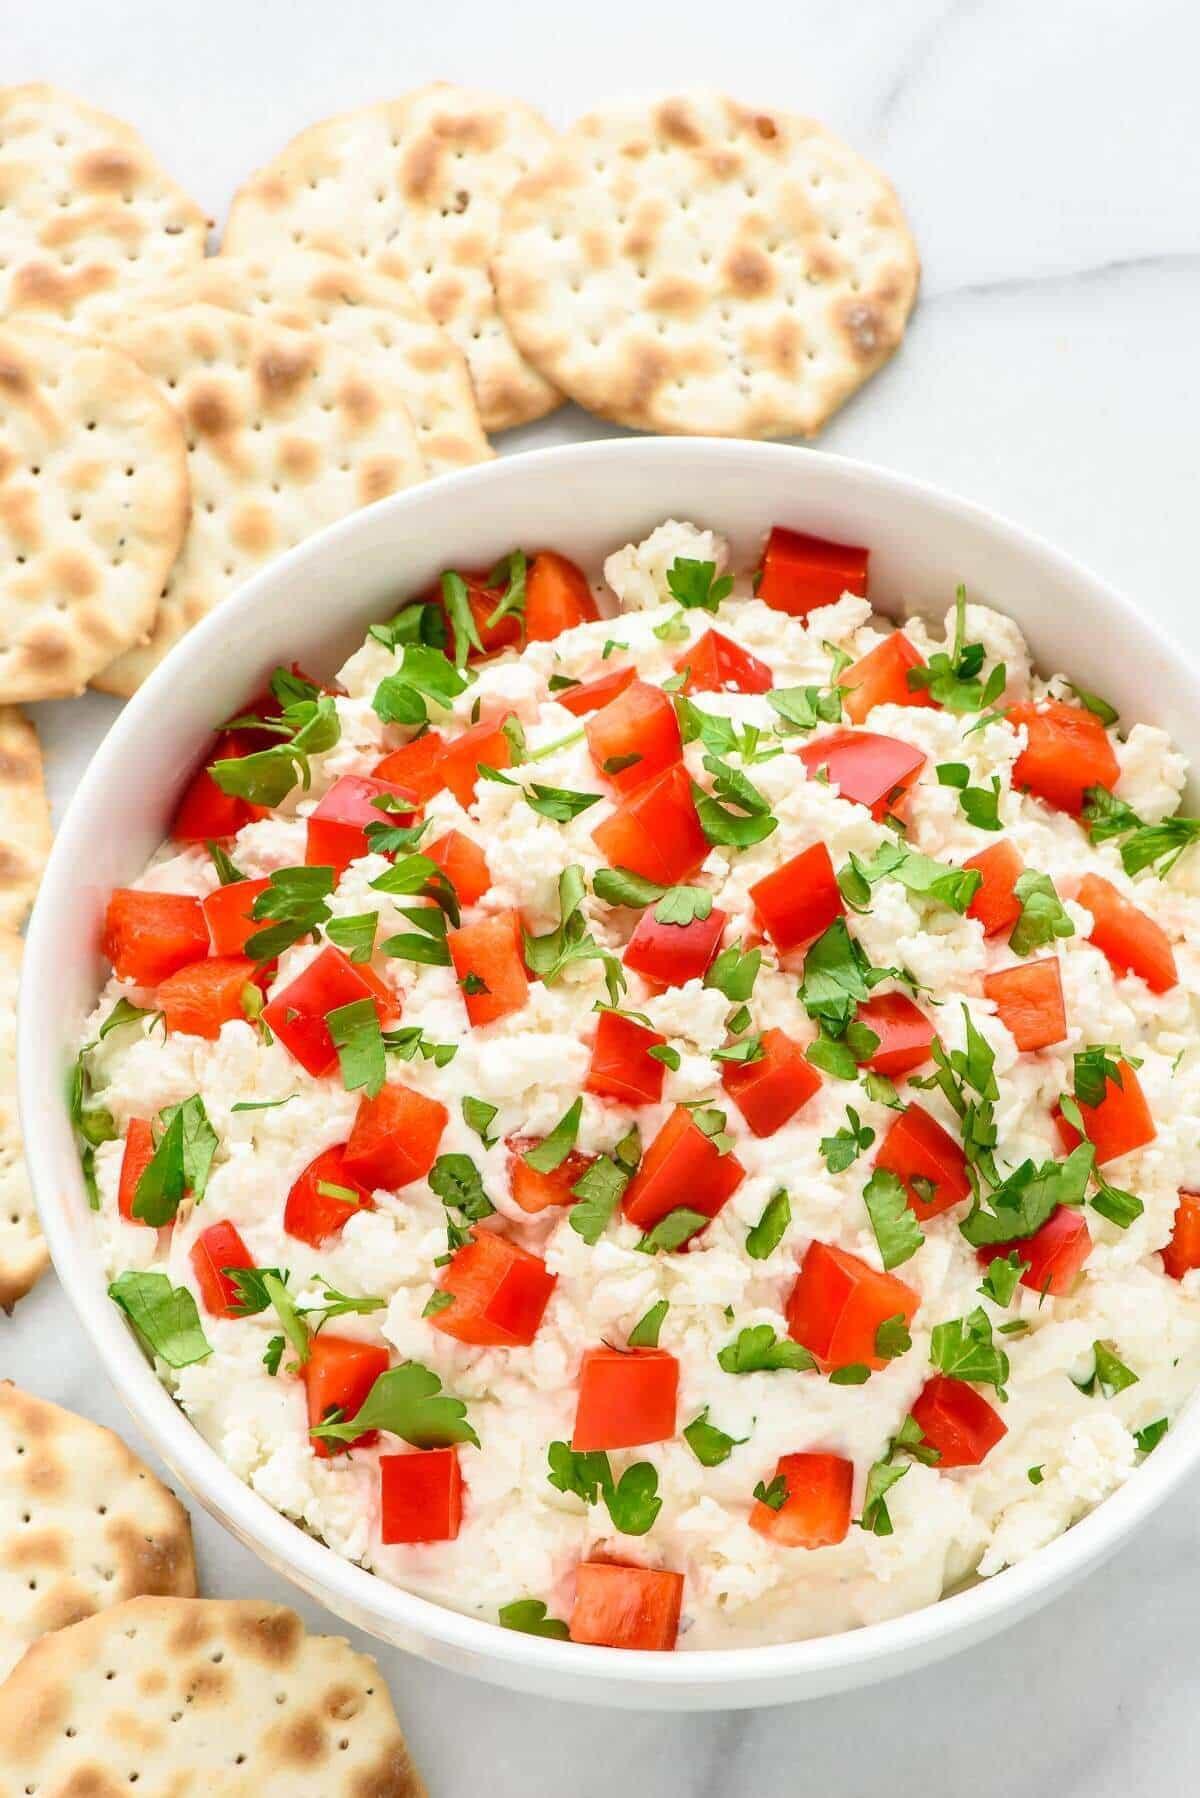 Christmas Dips And Appetizers  Easy Garlic Feta Dip